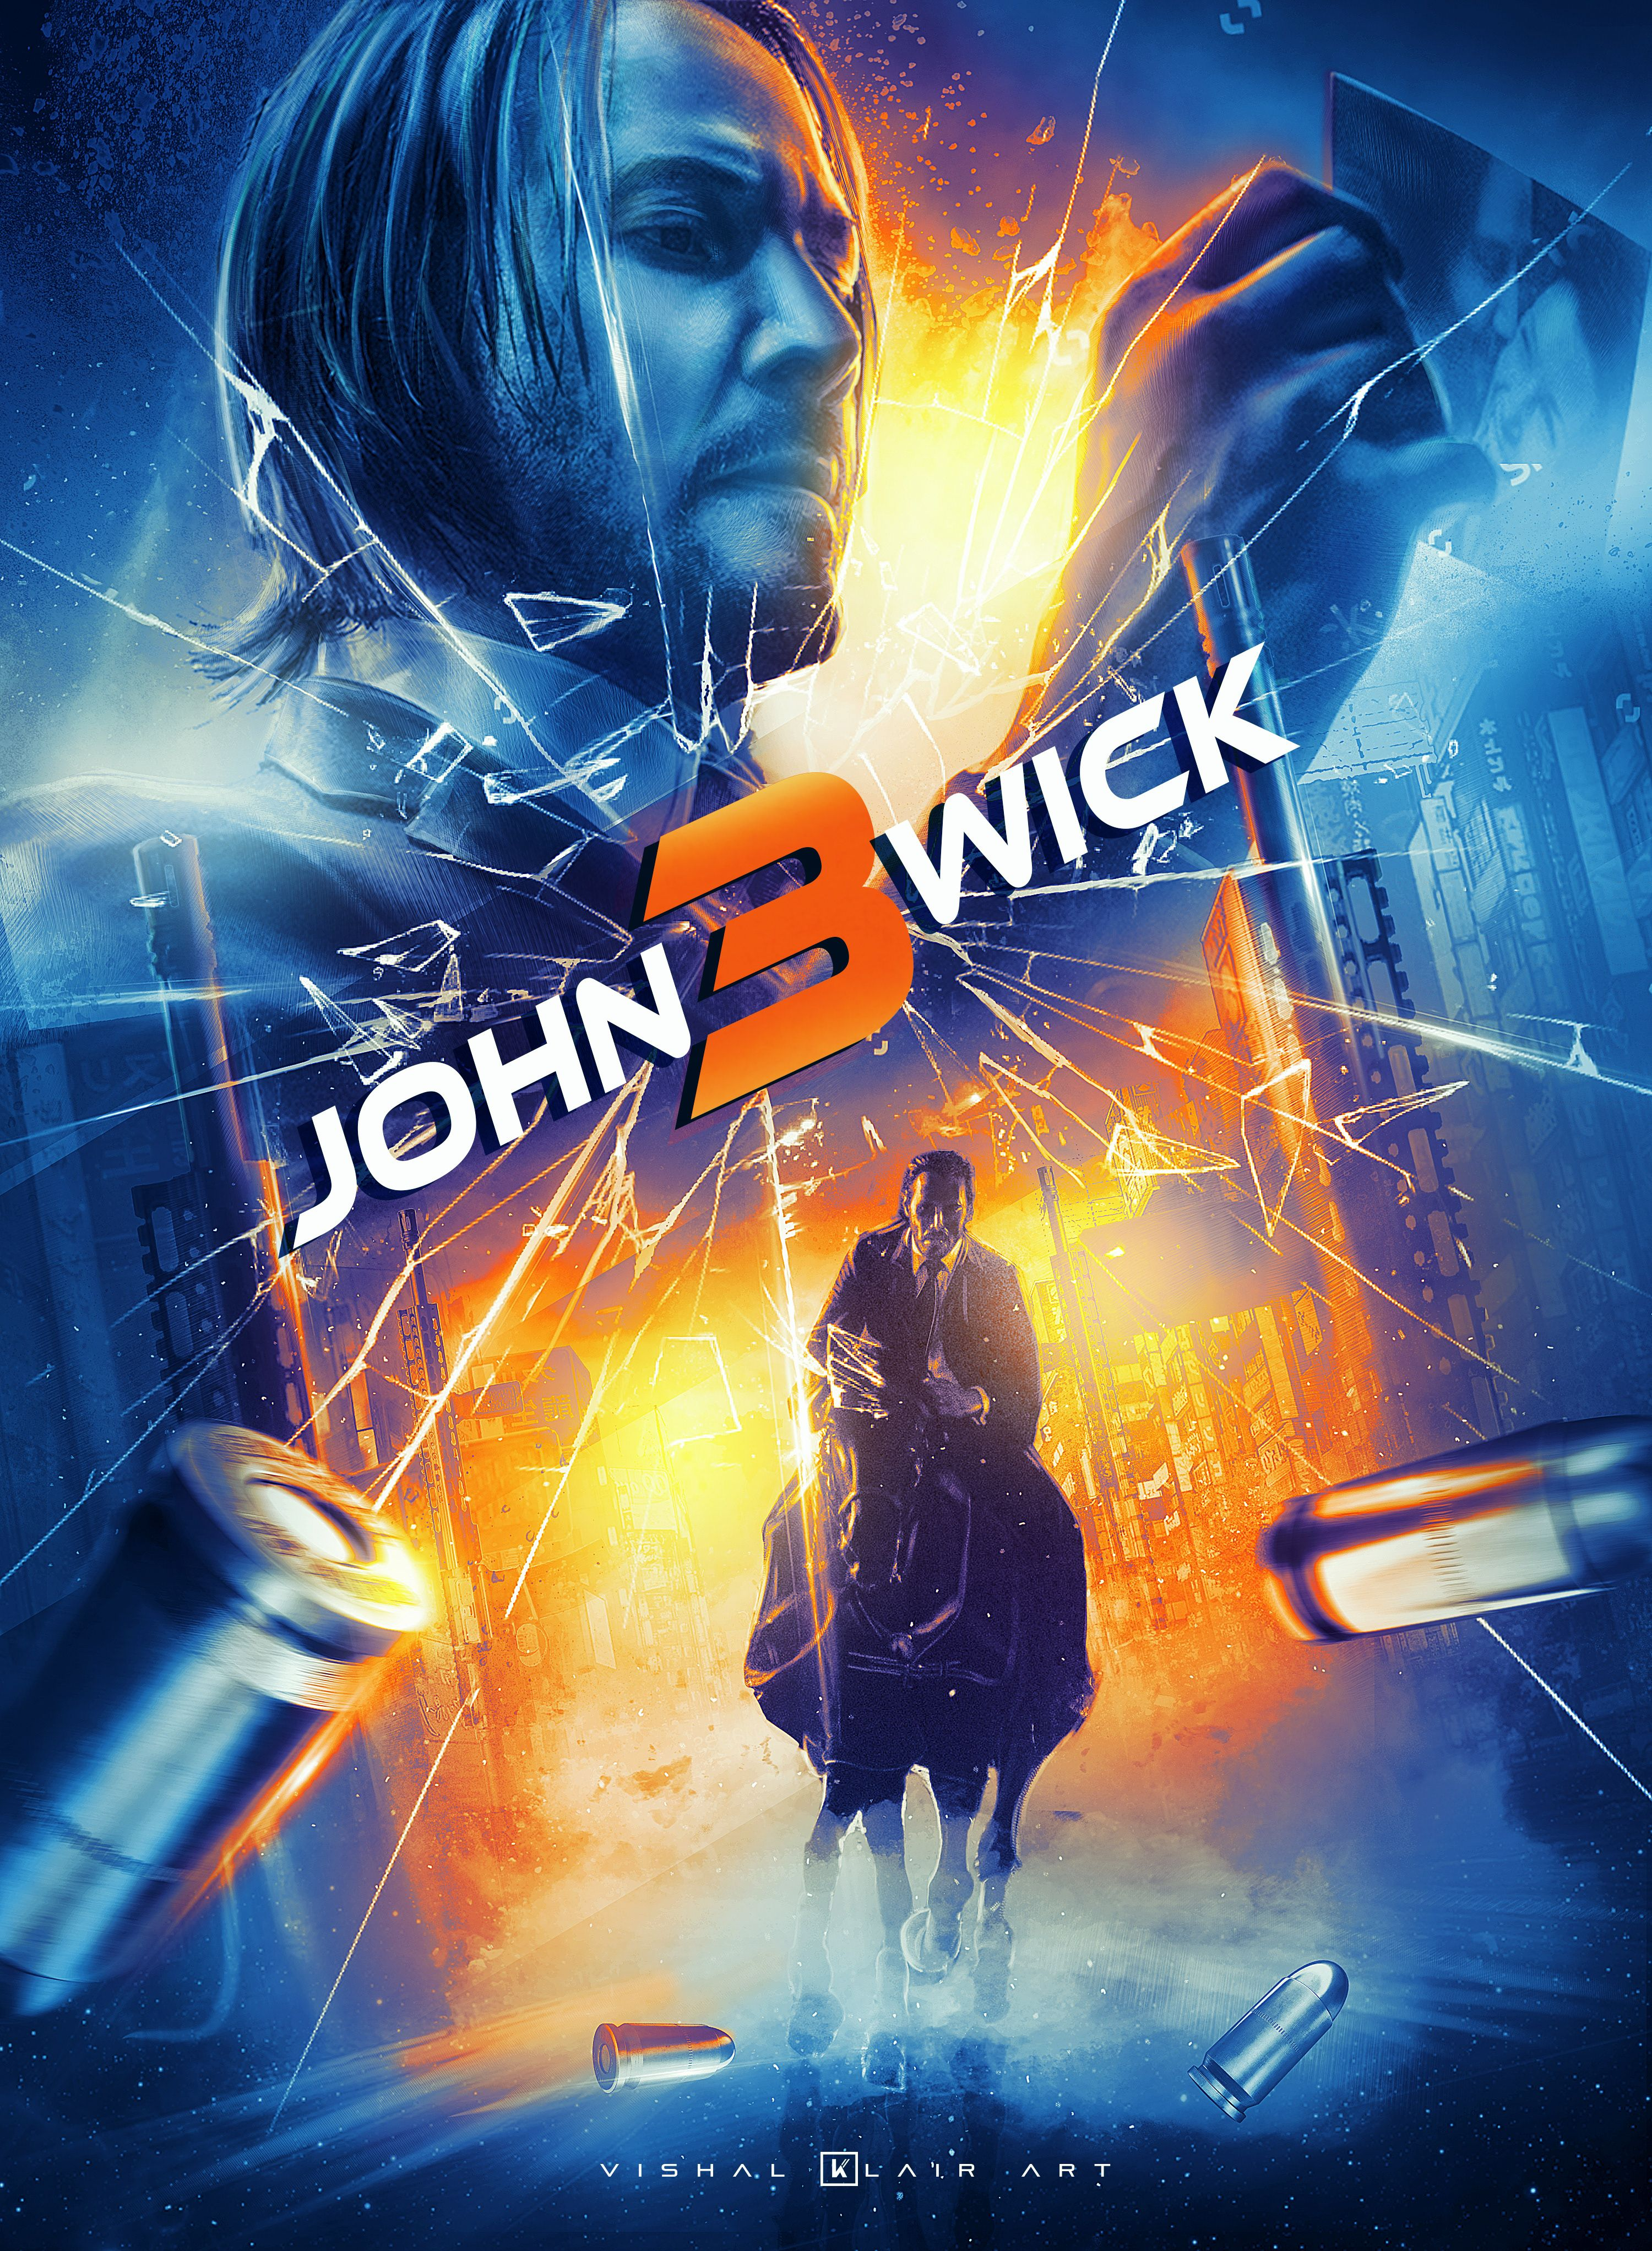 Pin By Vishal Klair On Moive Poster In 2019 John Wick Movie Keanu